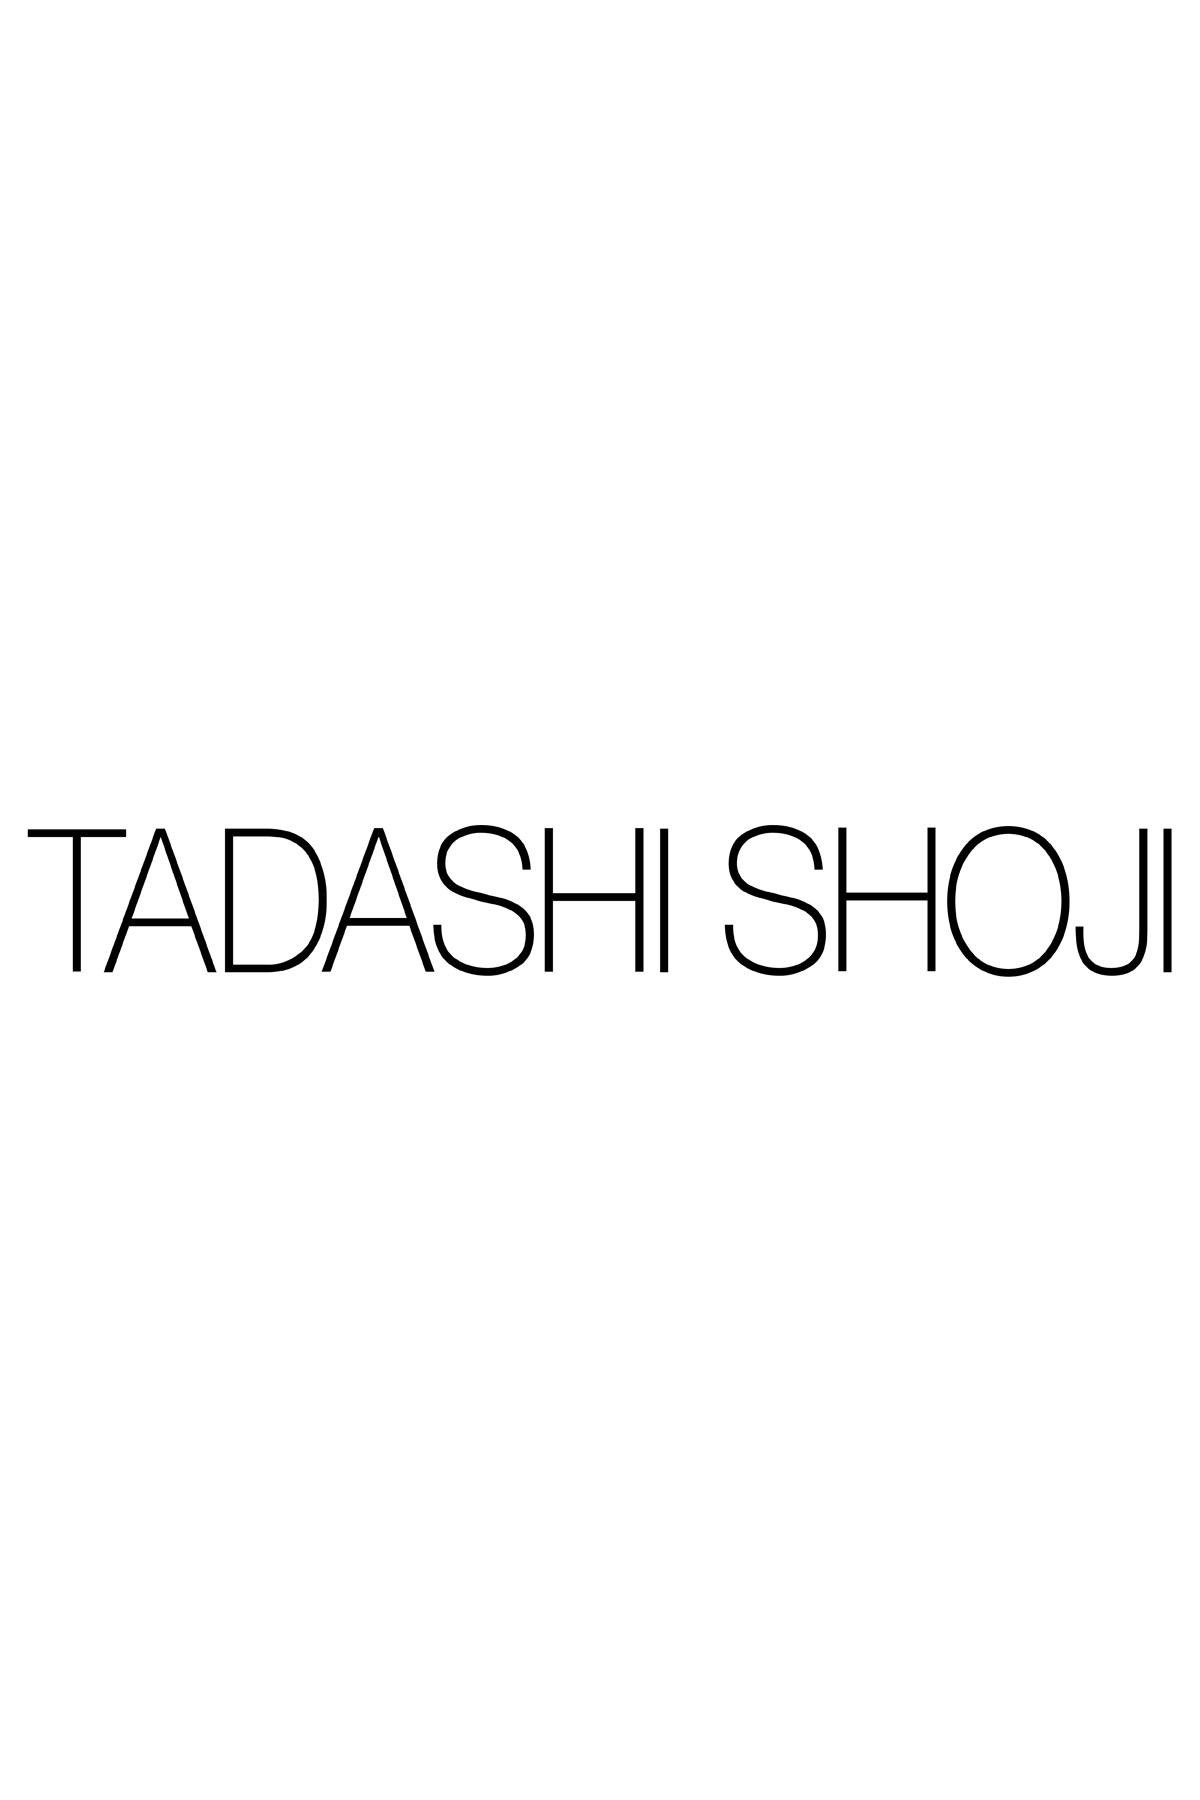 Alexandra Embroidered Lace Gown - PLUS SIZE | Tadashi Shoji